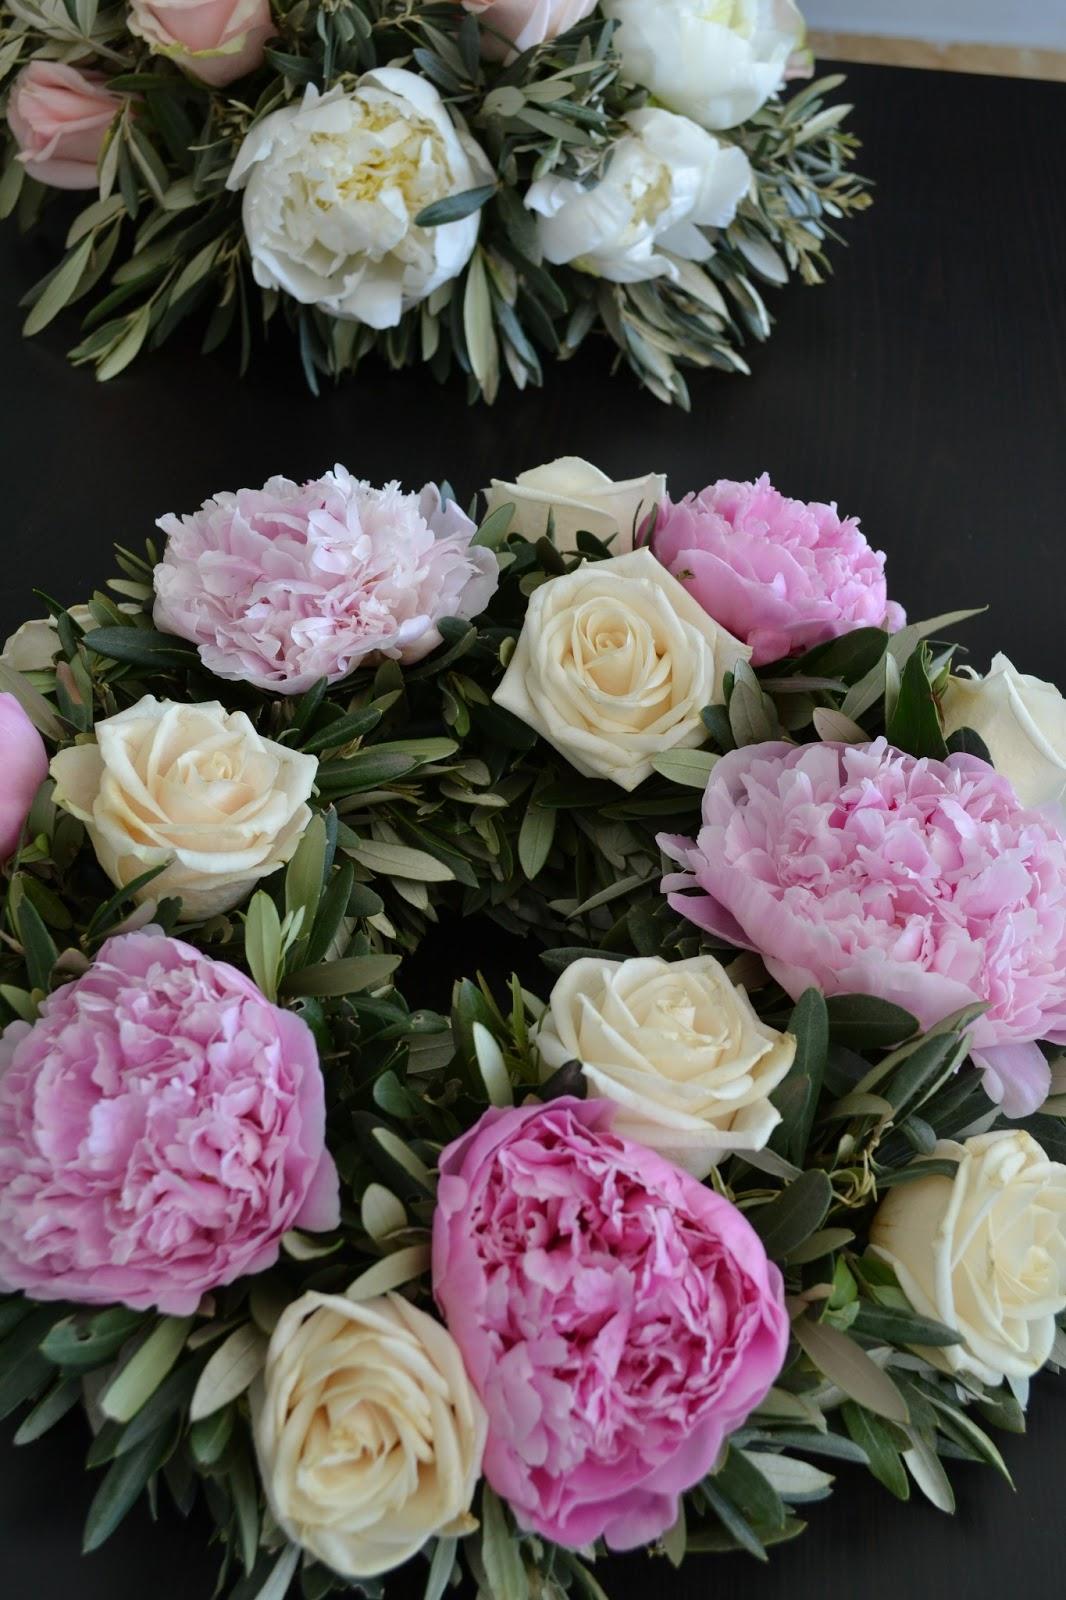 Wedding Centerpiece Tips And Ideas Weddings In Greece